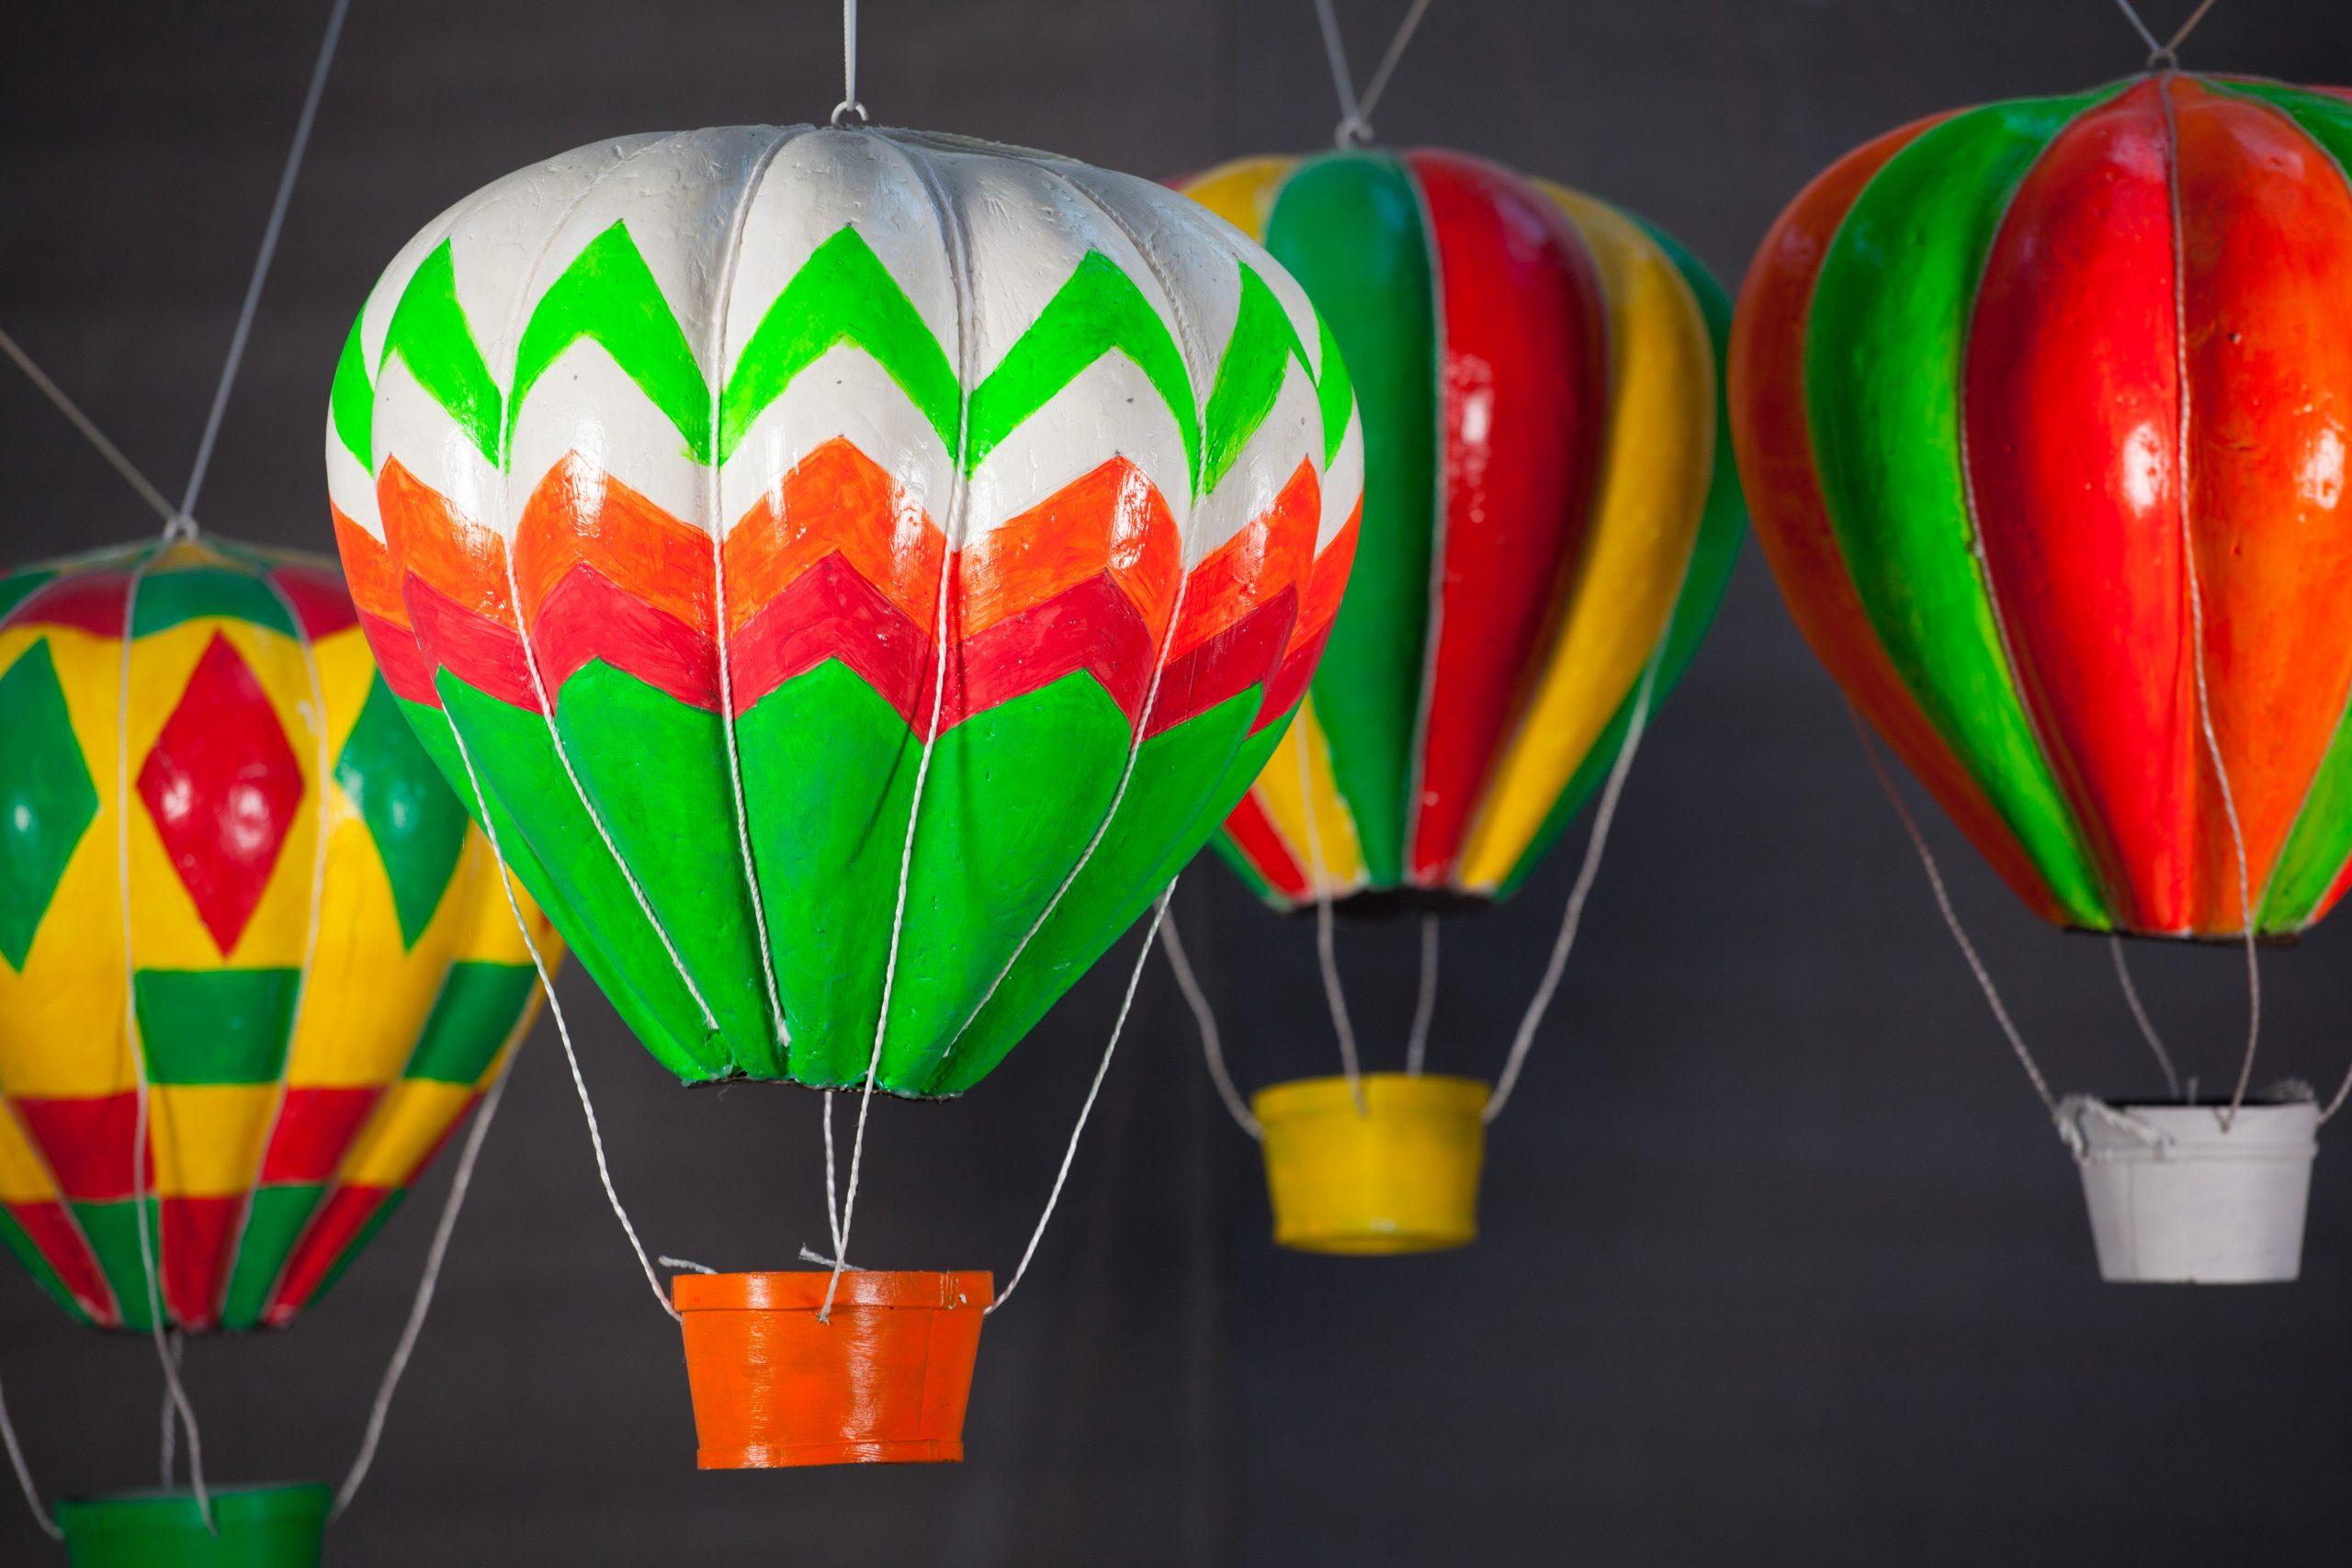 balon cu aer cald, inchiriere decoruri, petrecere tematice, photo corner